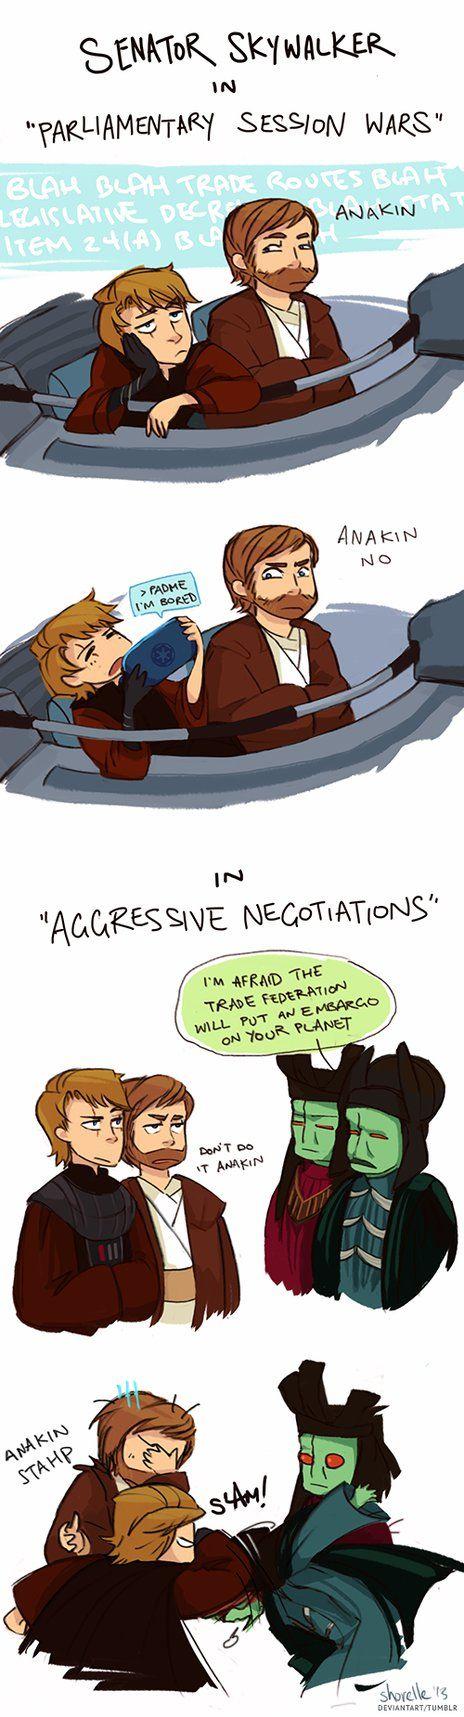 more dumb star wars comics by shorelle on deviantART